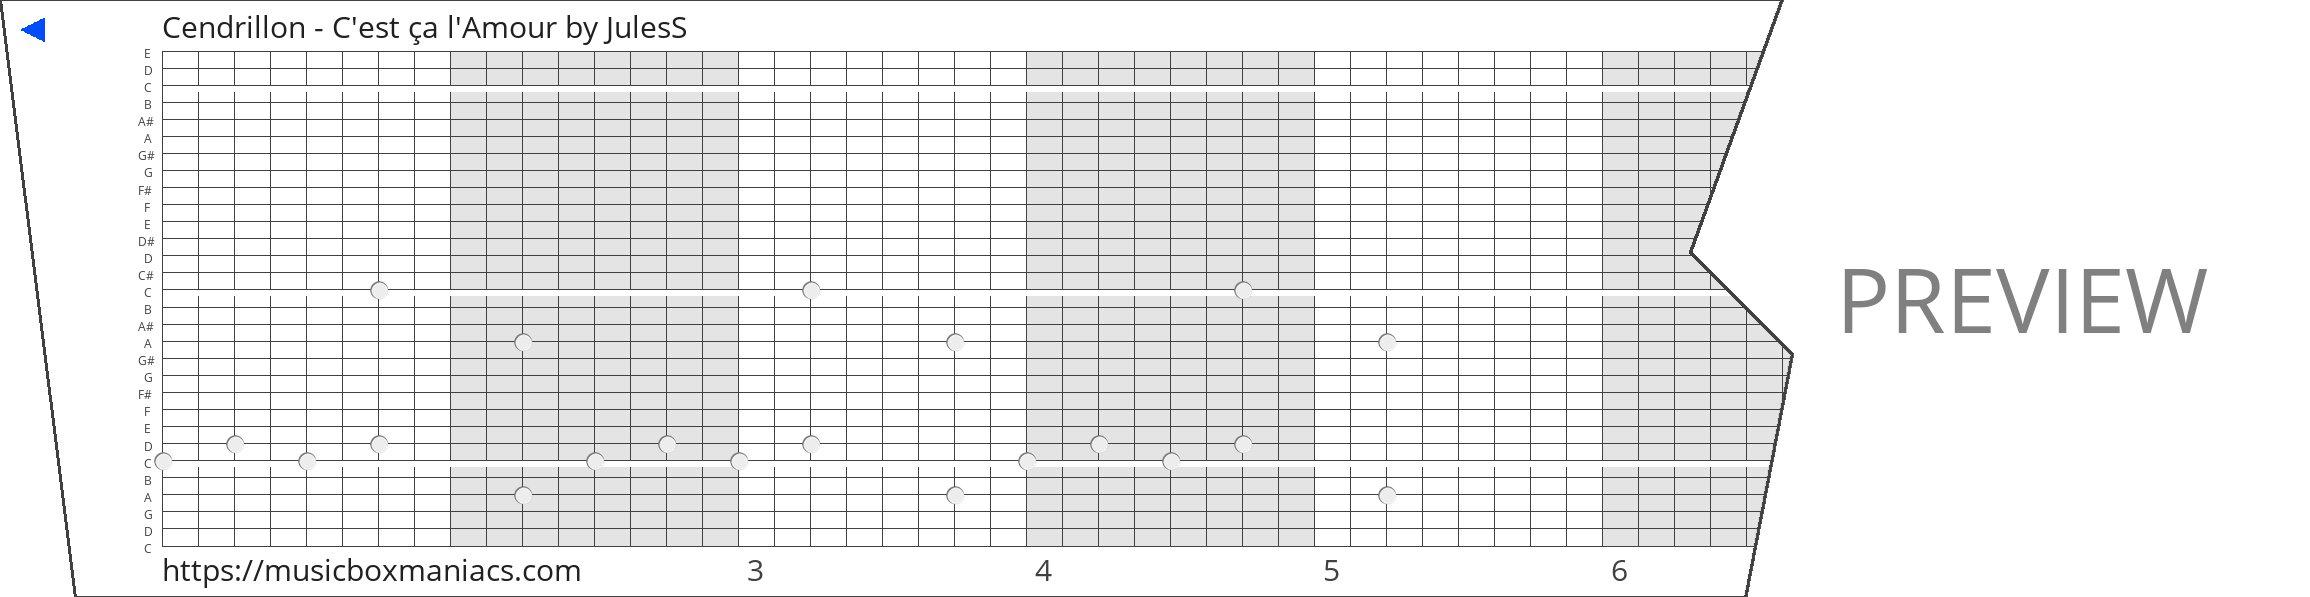 Cendrillon - C'est ça l'Amour 30 note music box paper strip